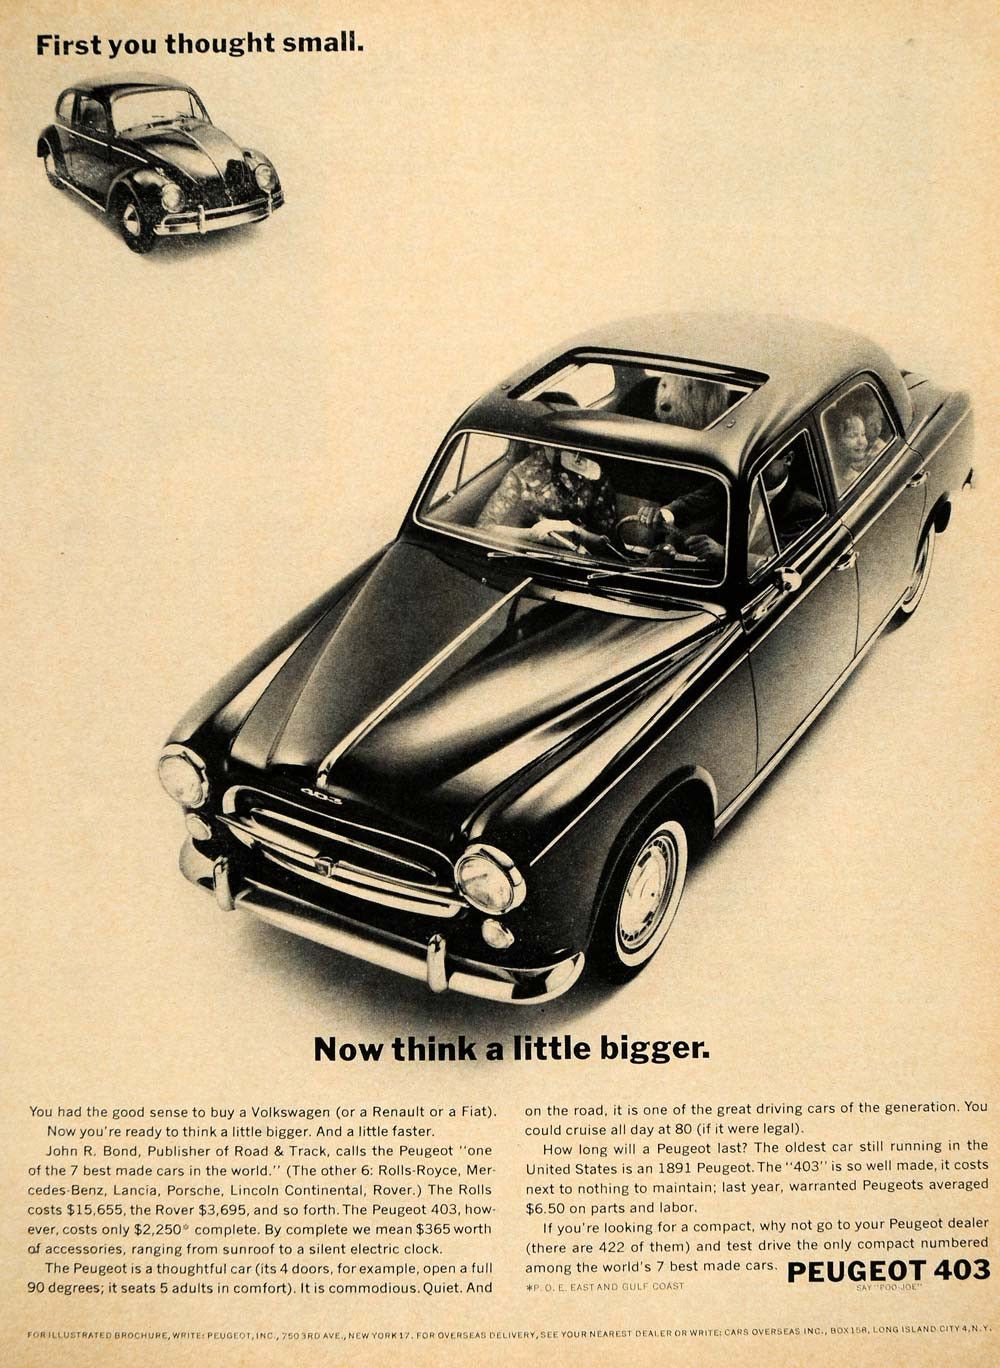 1961 ad peugeot 403 best car road & track john r bond - original